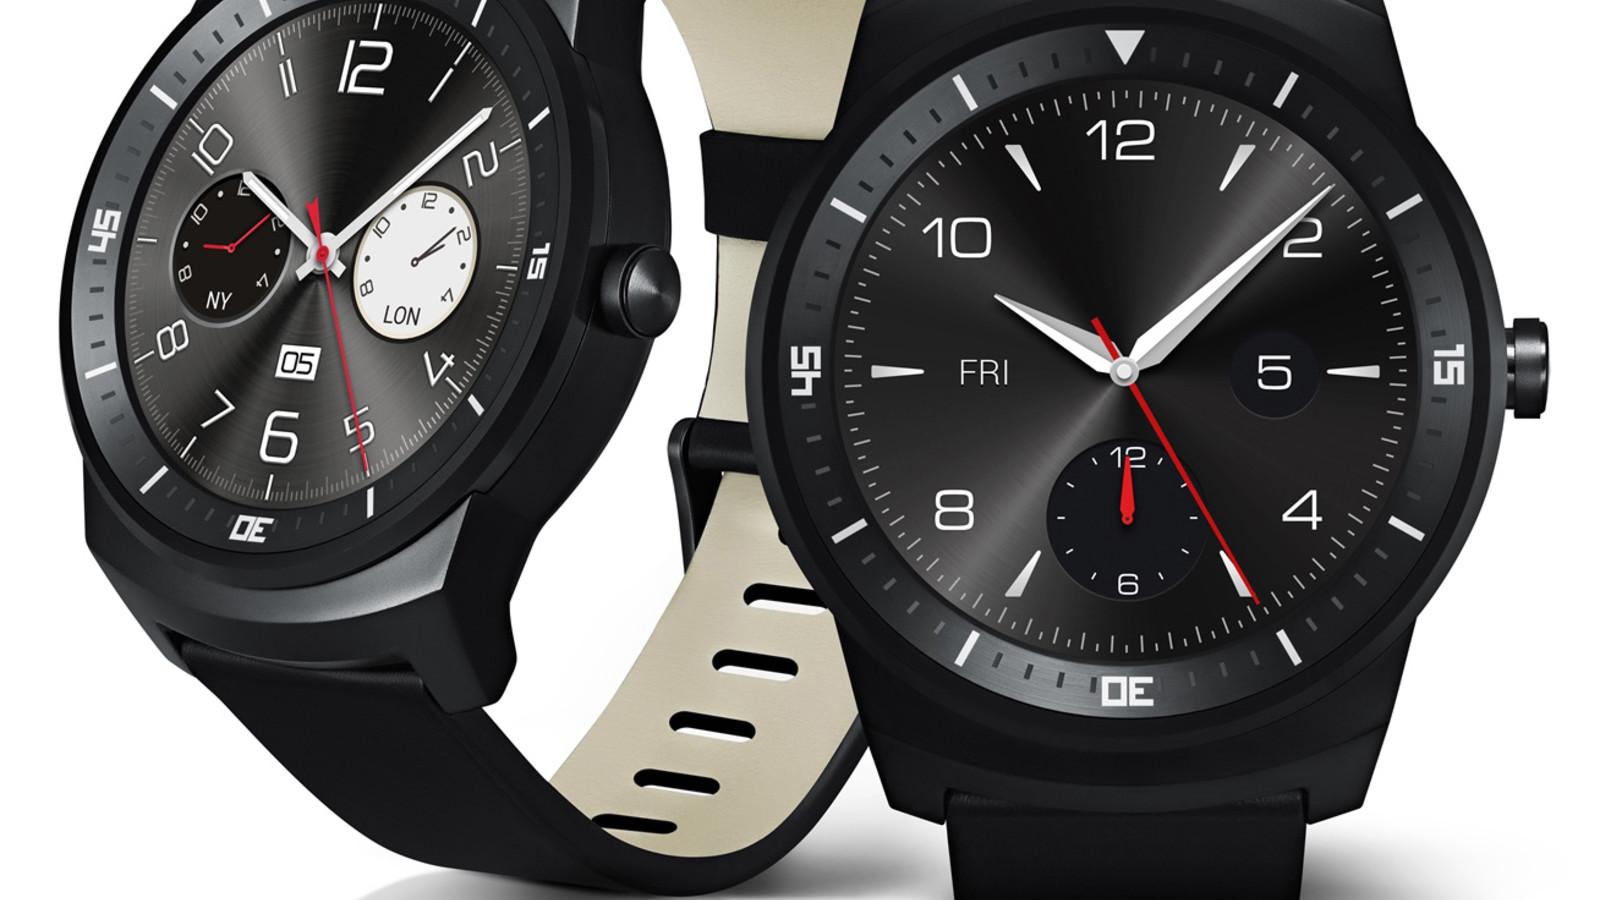 LG G Watch R price cut